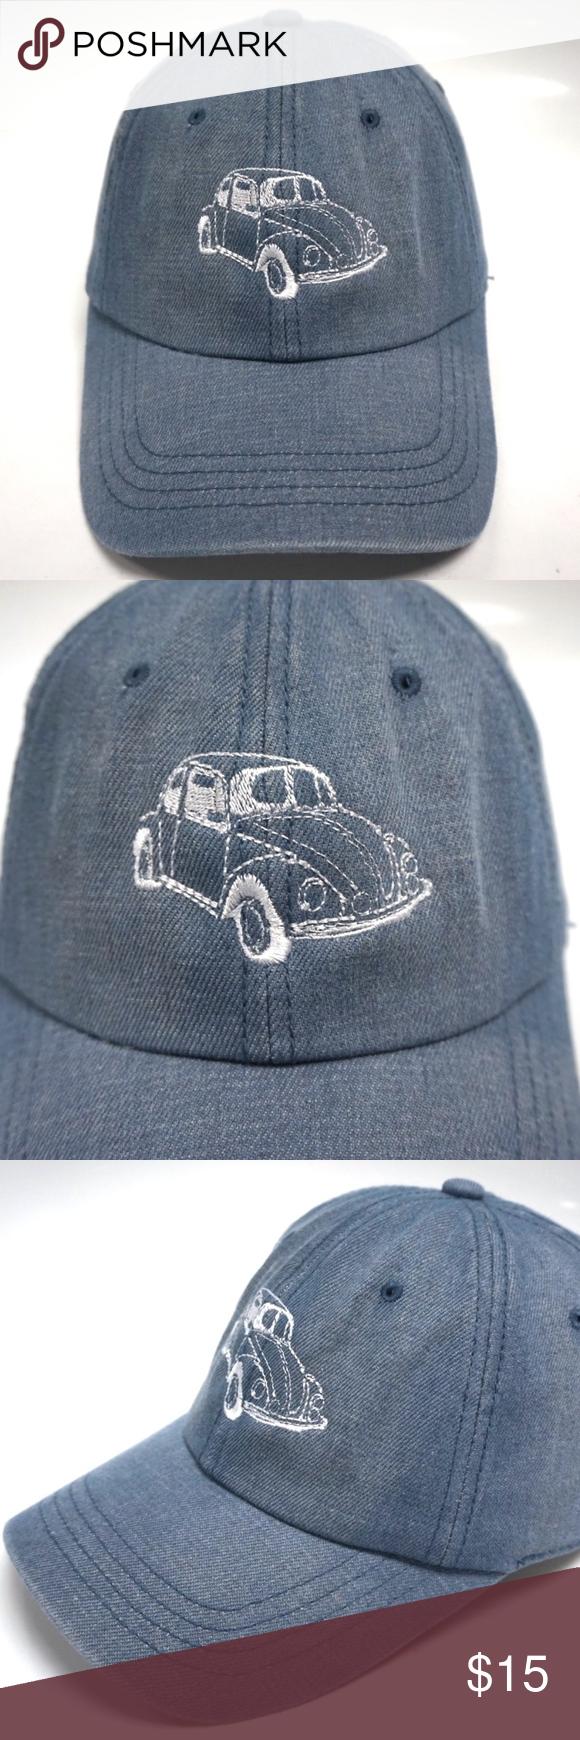 Volkswagen VW Bug Dad Hat Slouch Cap Volkswagen VW Bug Dad Hat Color  Denim  Blue c840ccda8dd